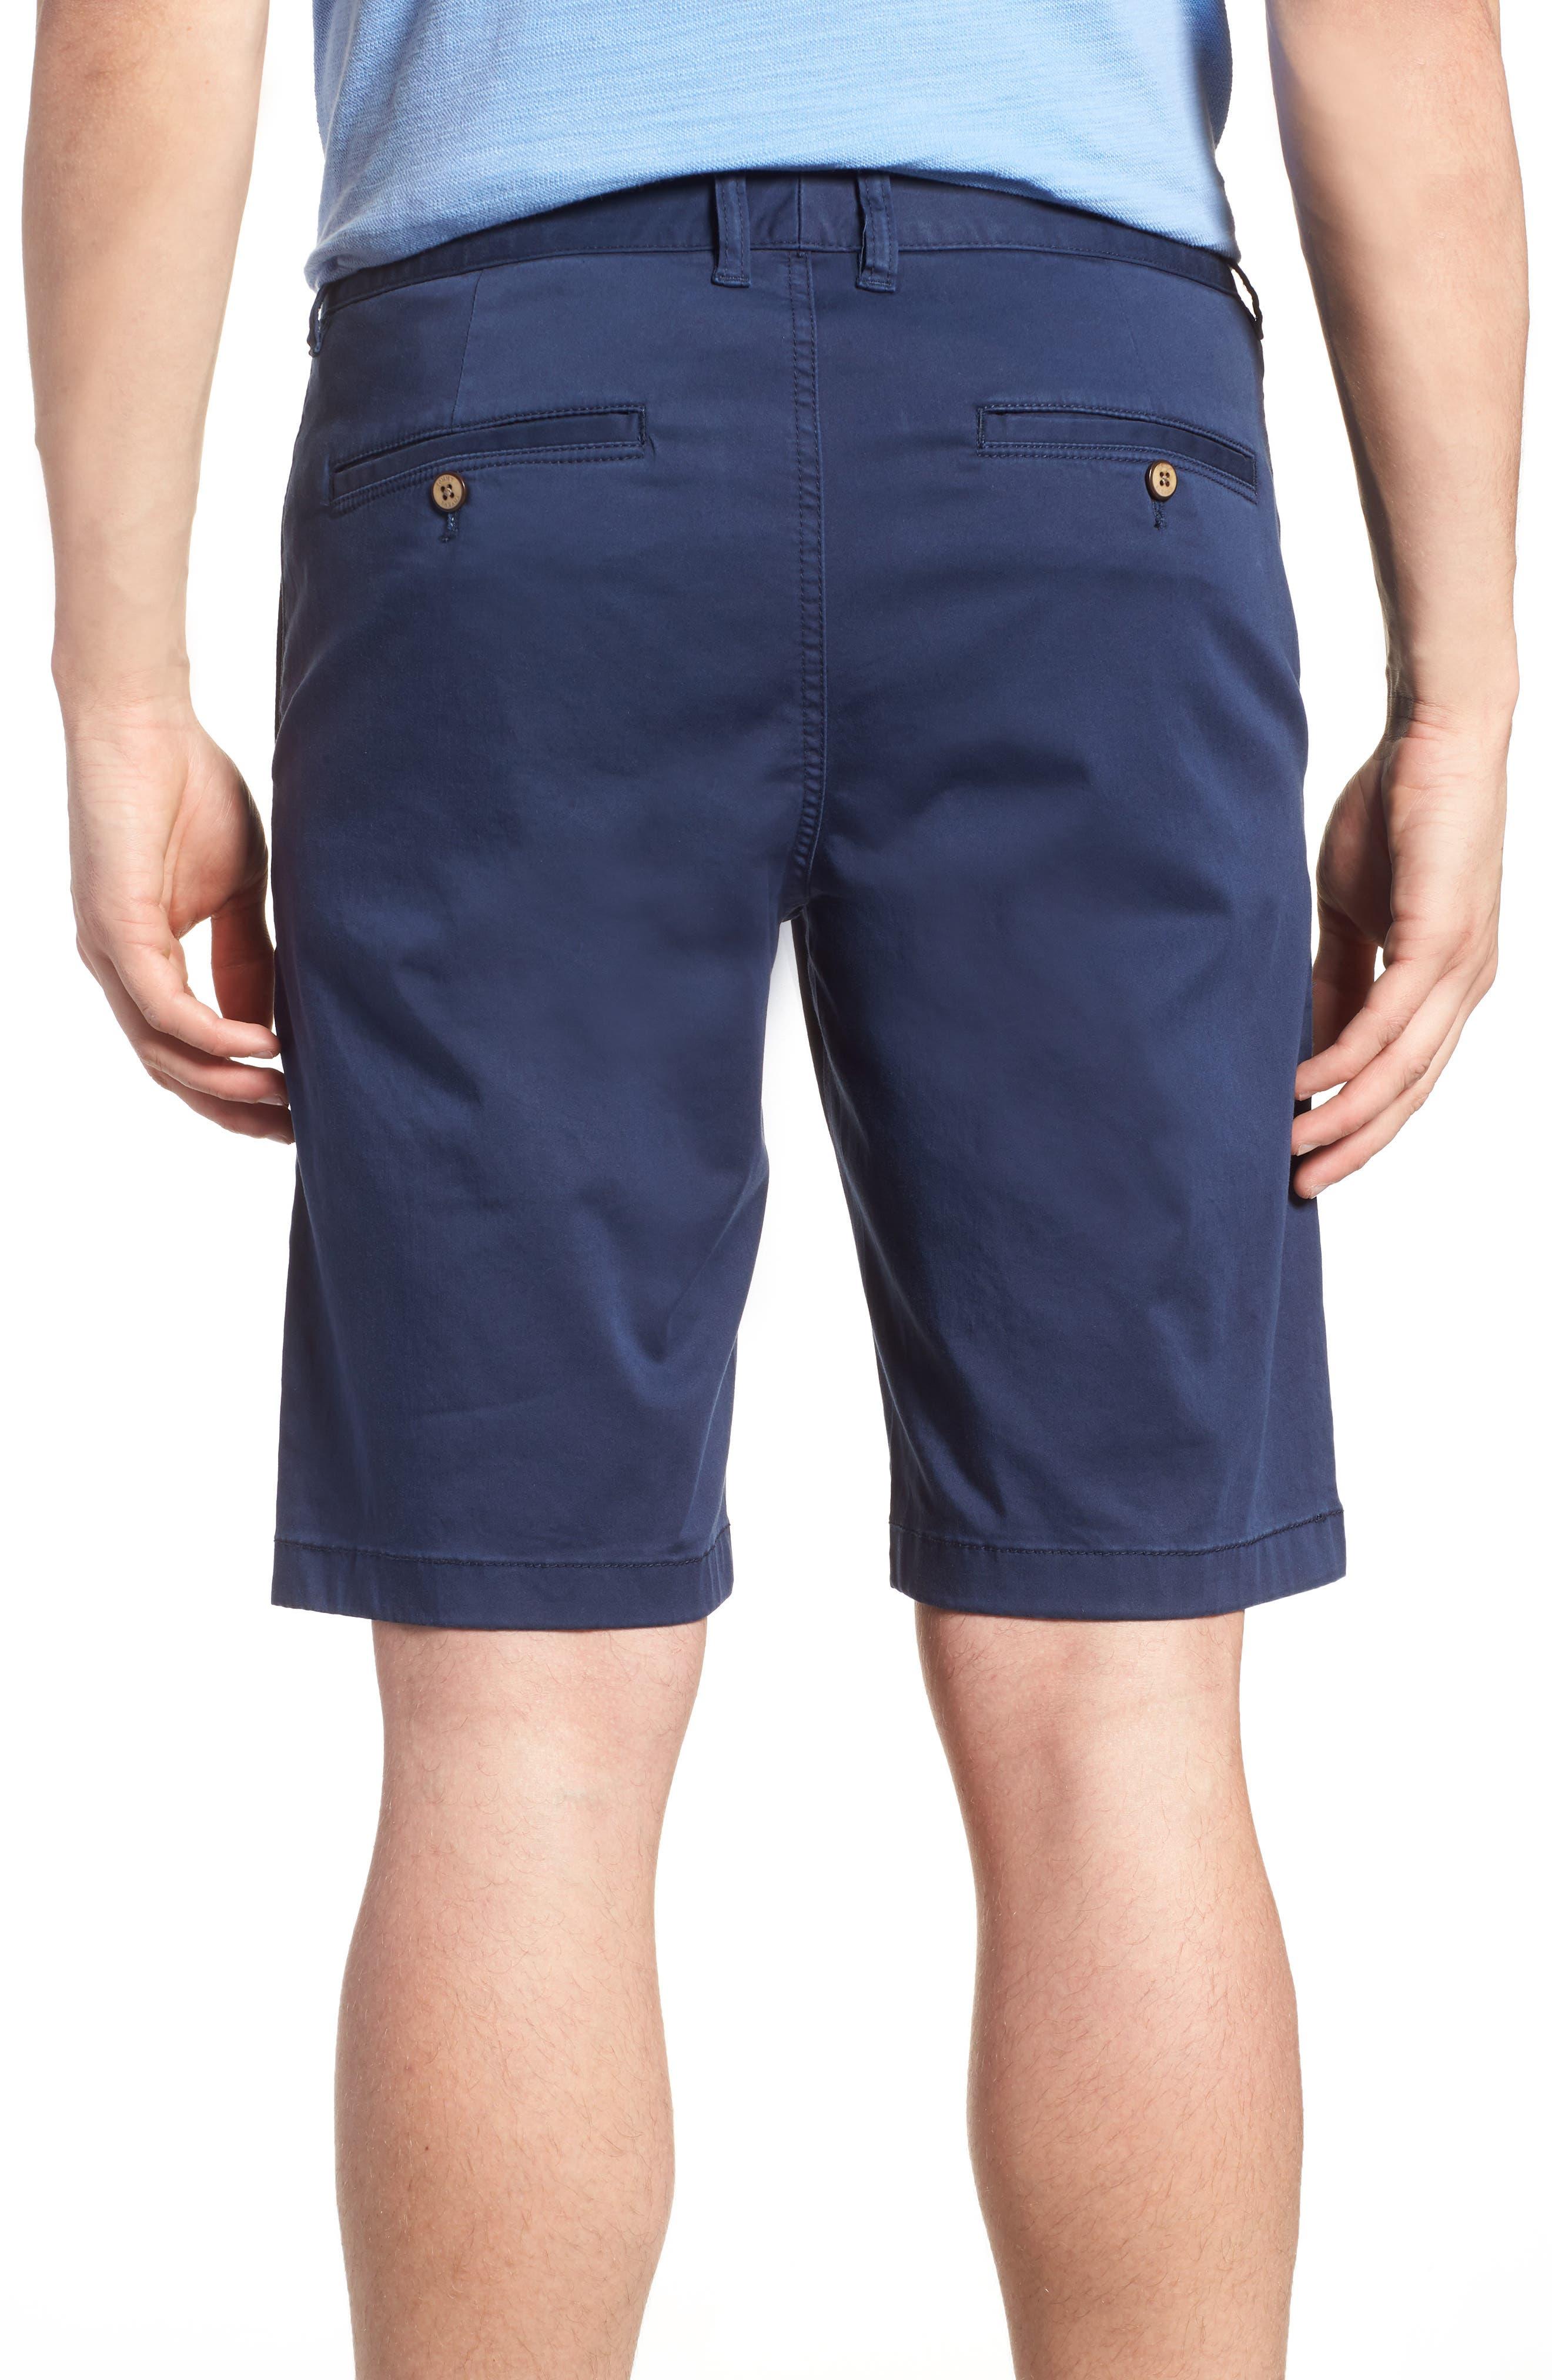 Boracay Chino Shorts,                             Alternate thumbnail 15, color,